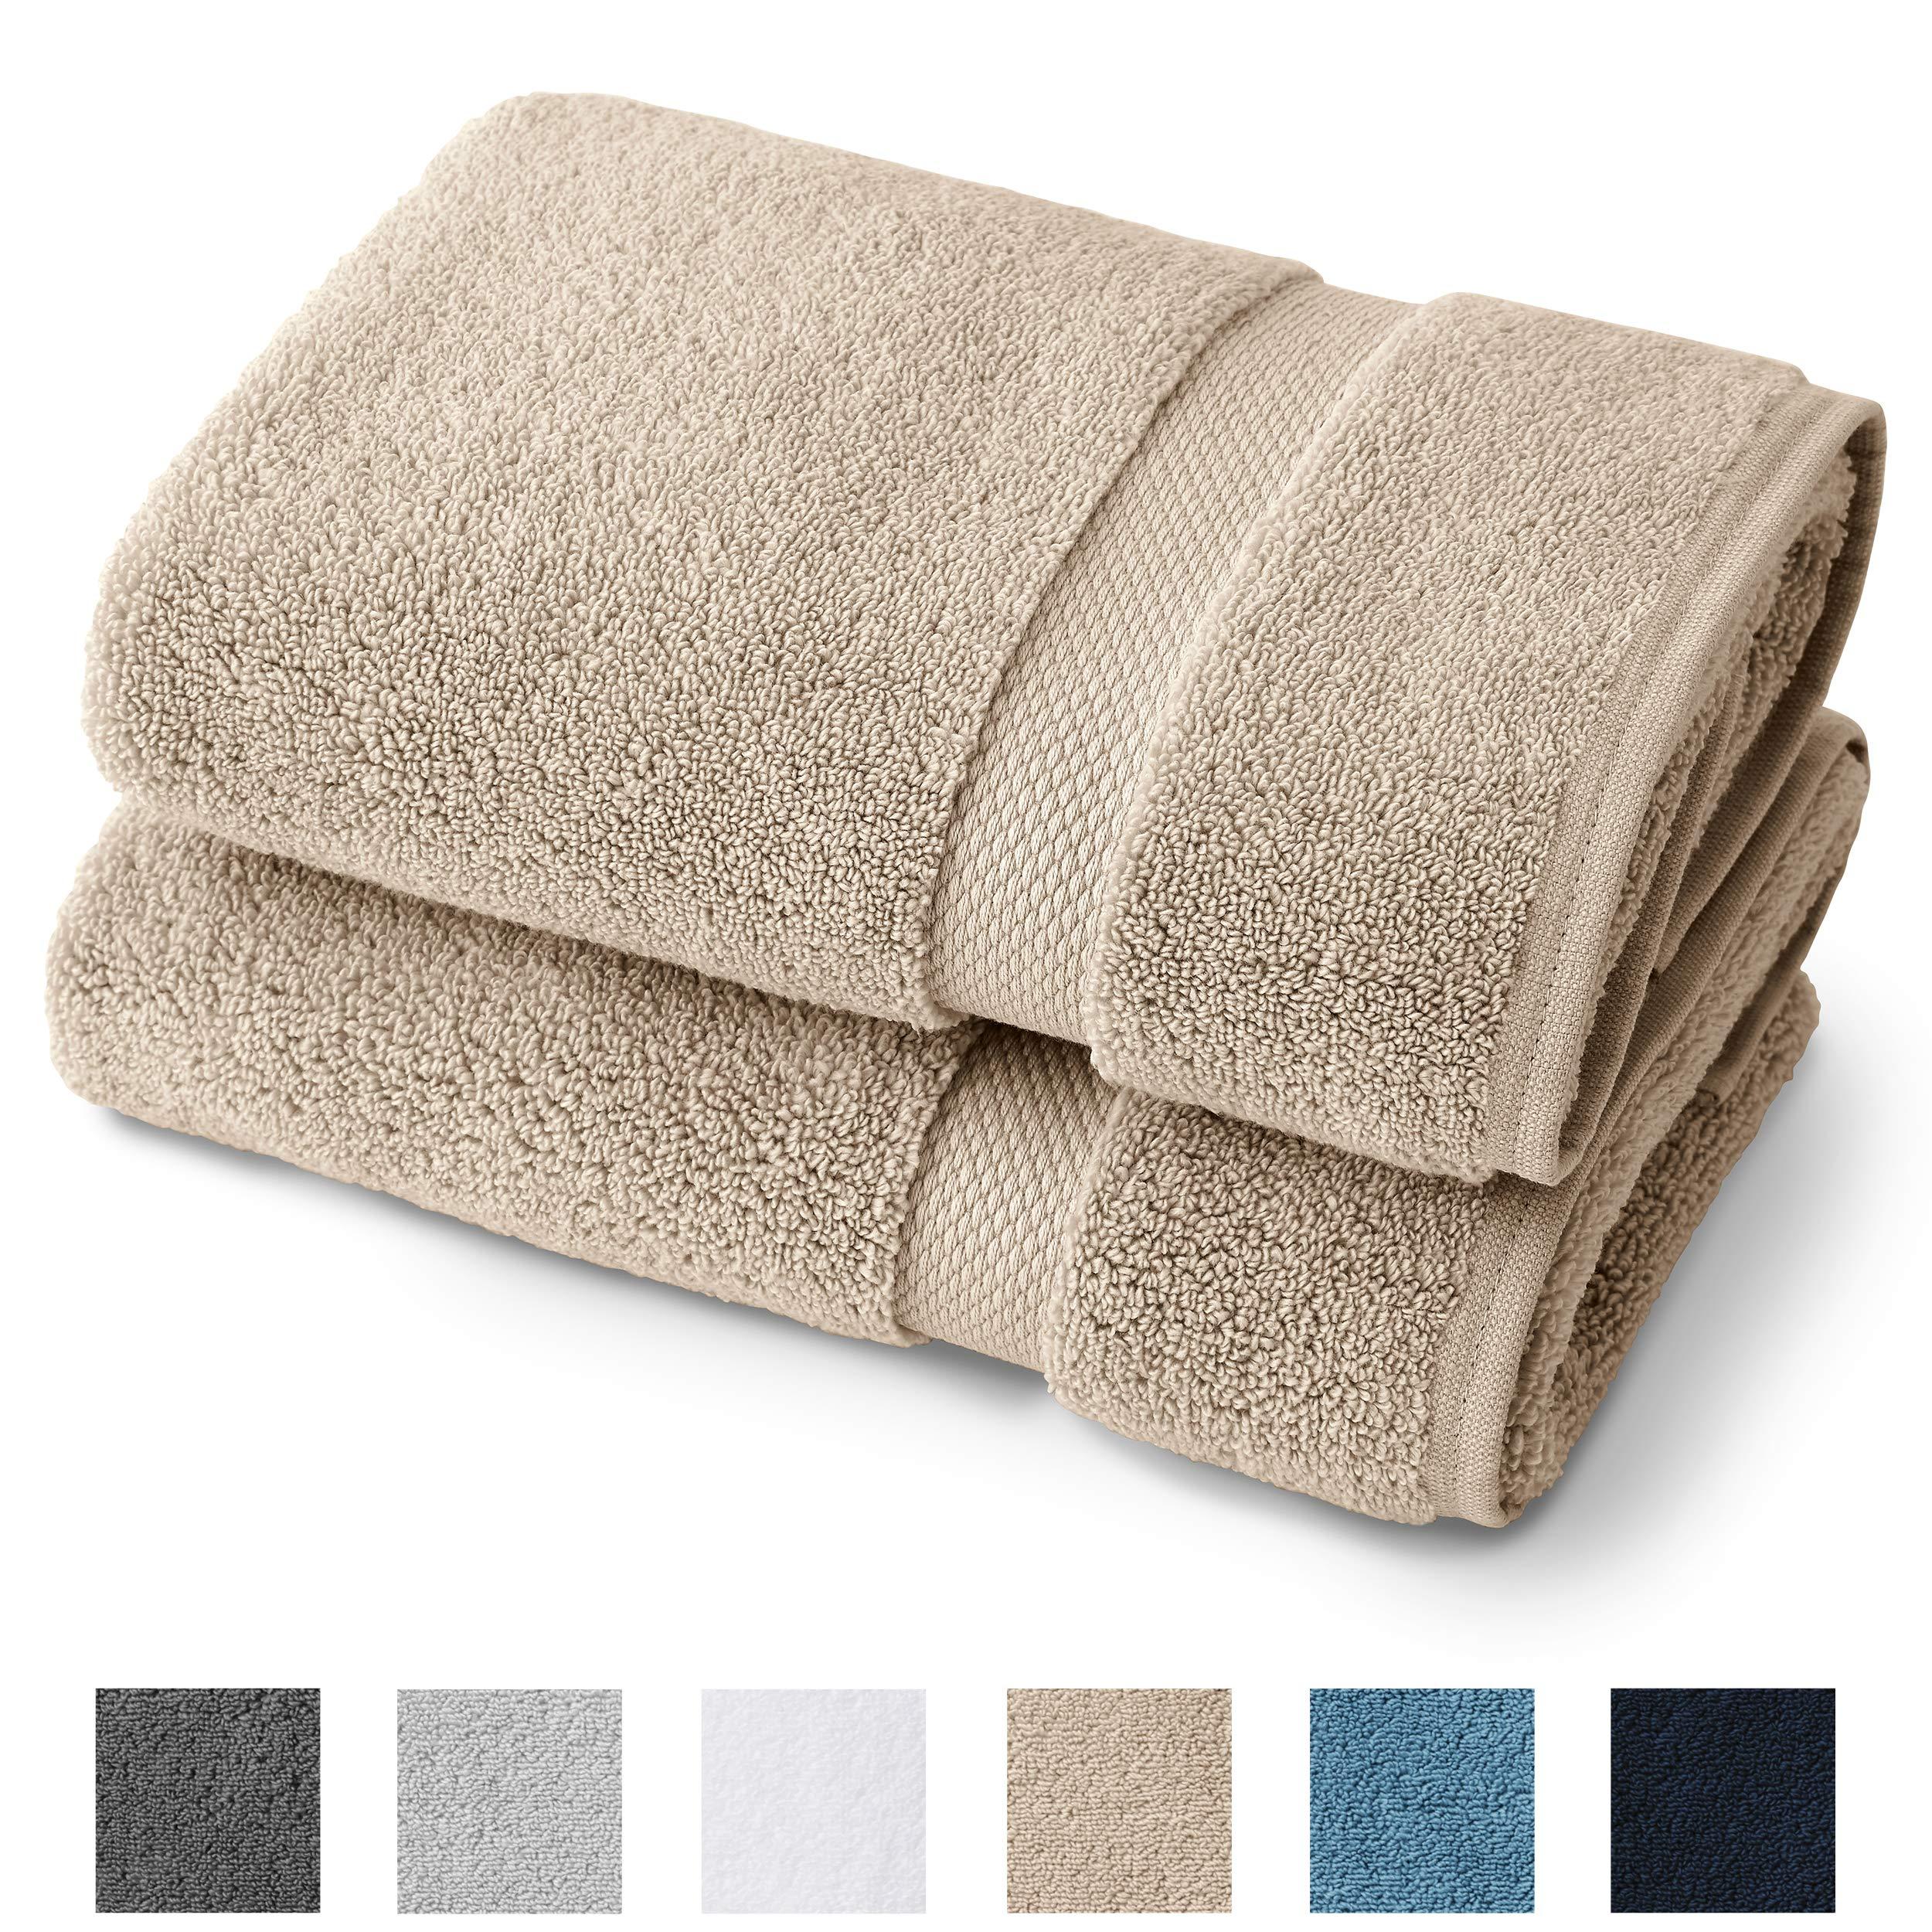 "Supima Cotton Bath Towel Set by Laguna Beach Textile Co - 2 Bath Towels - Hotel Quality, Plush, 730 GSM - Large, 57"" x 30"" - Sand"